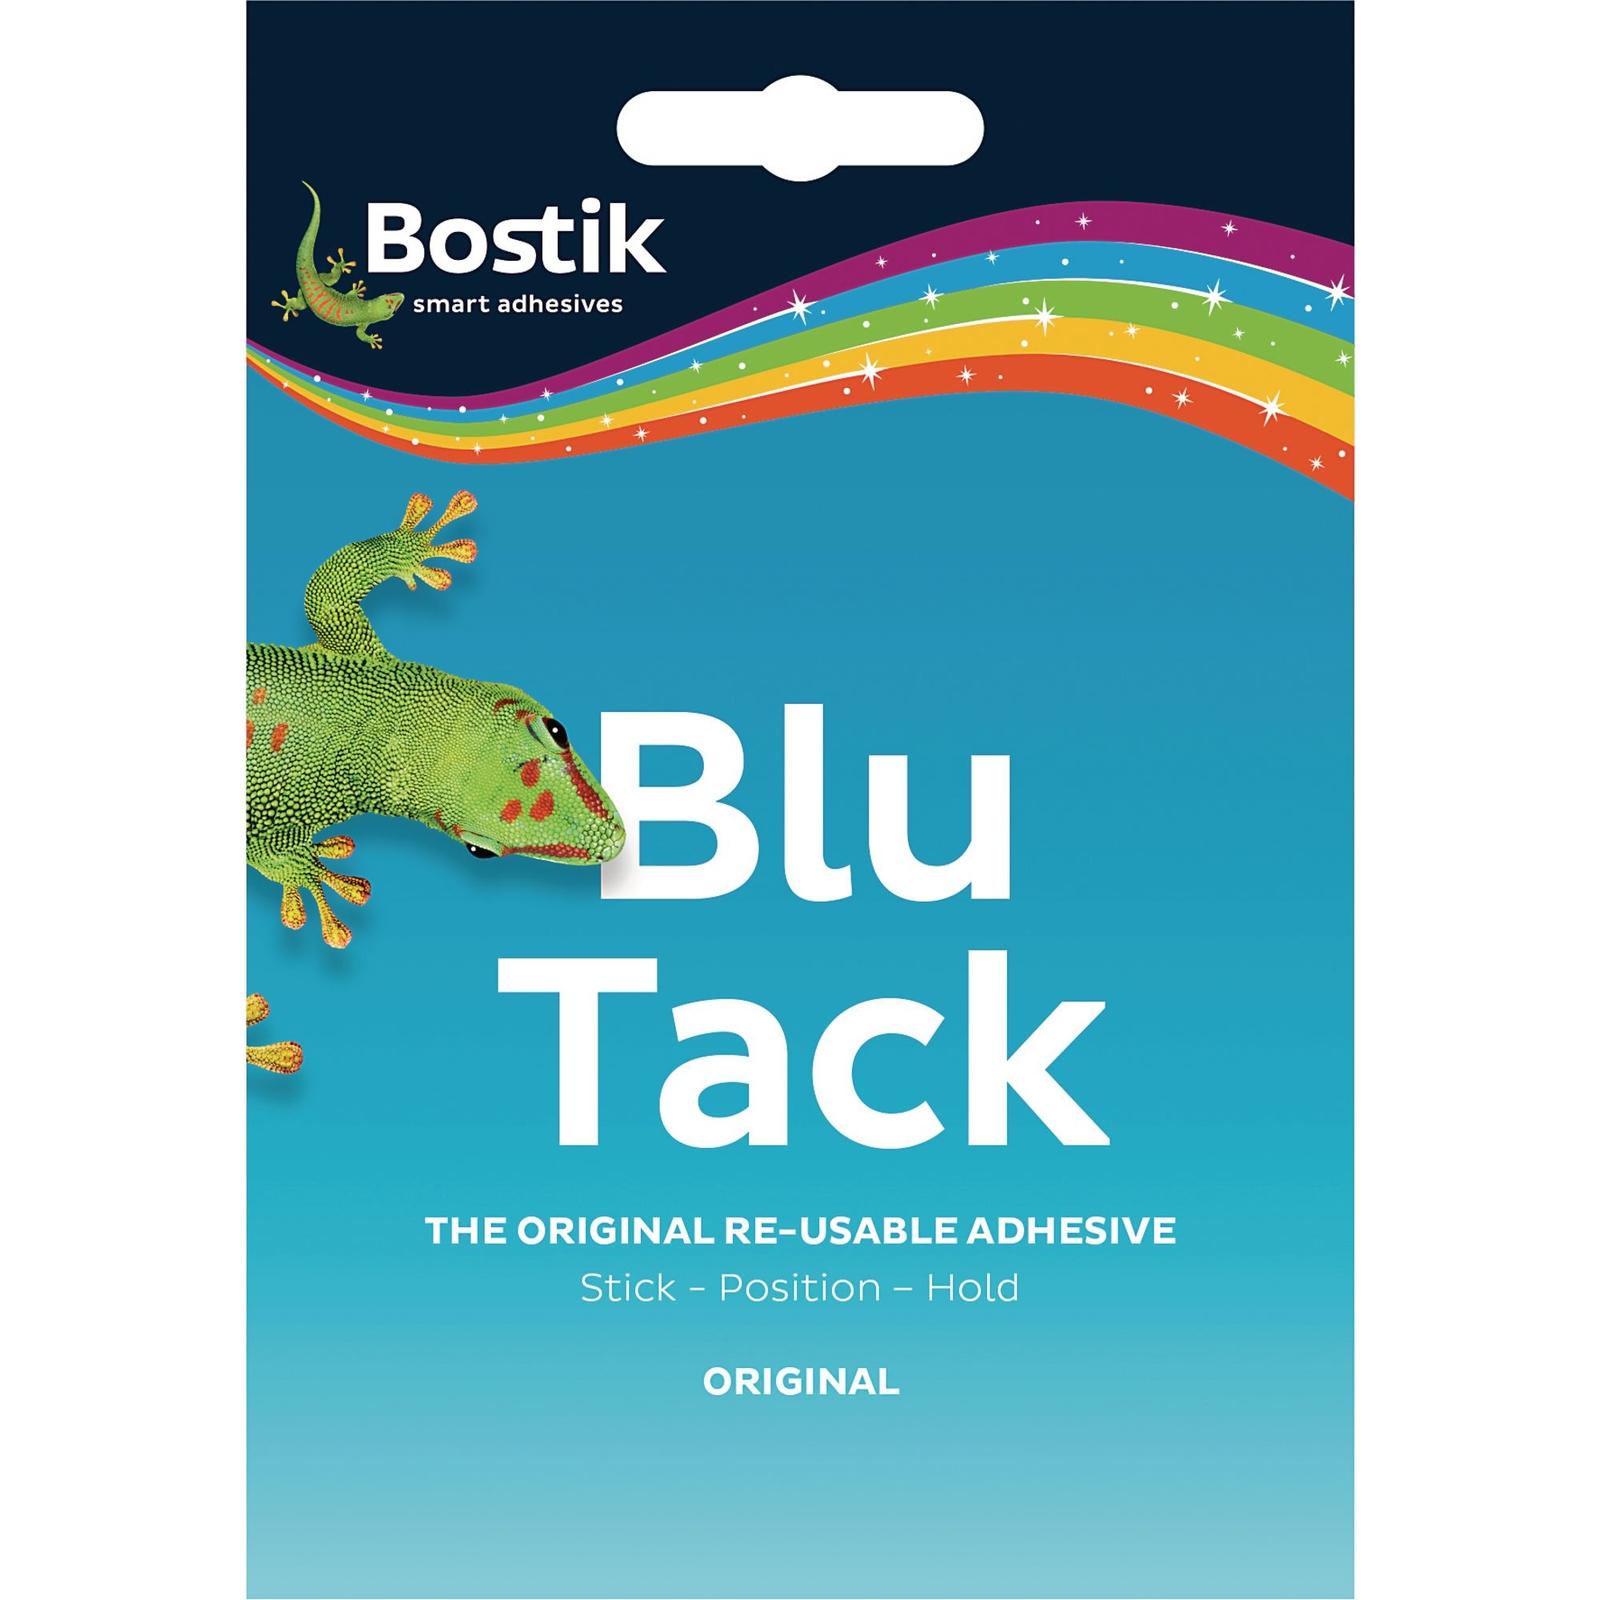 Bostik Blu Tack Blue Original 60g- Pack of 12